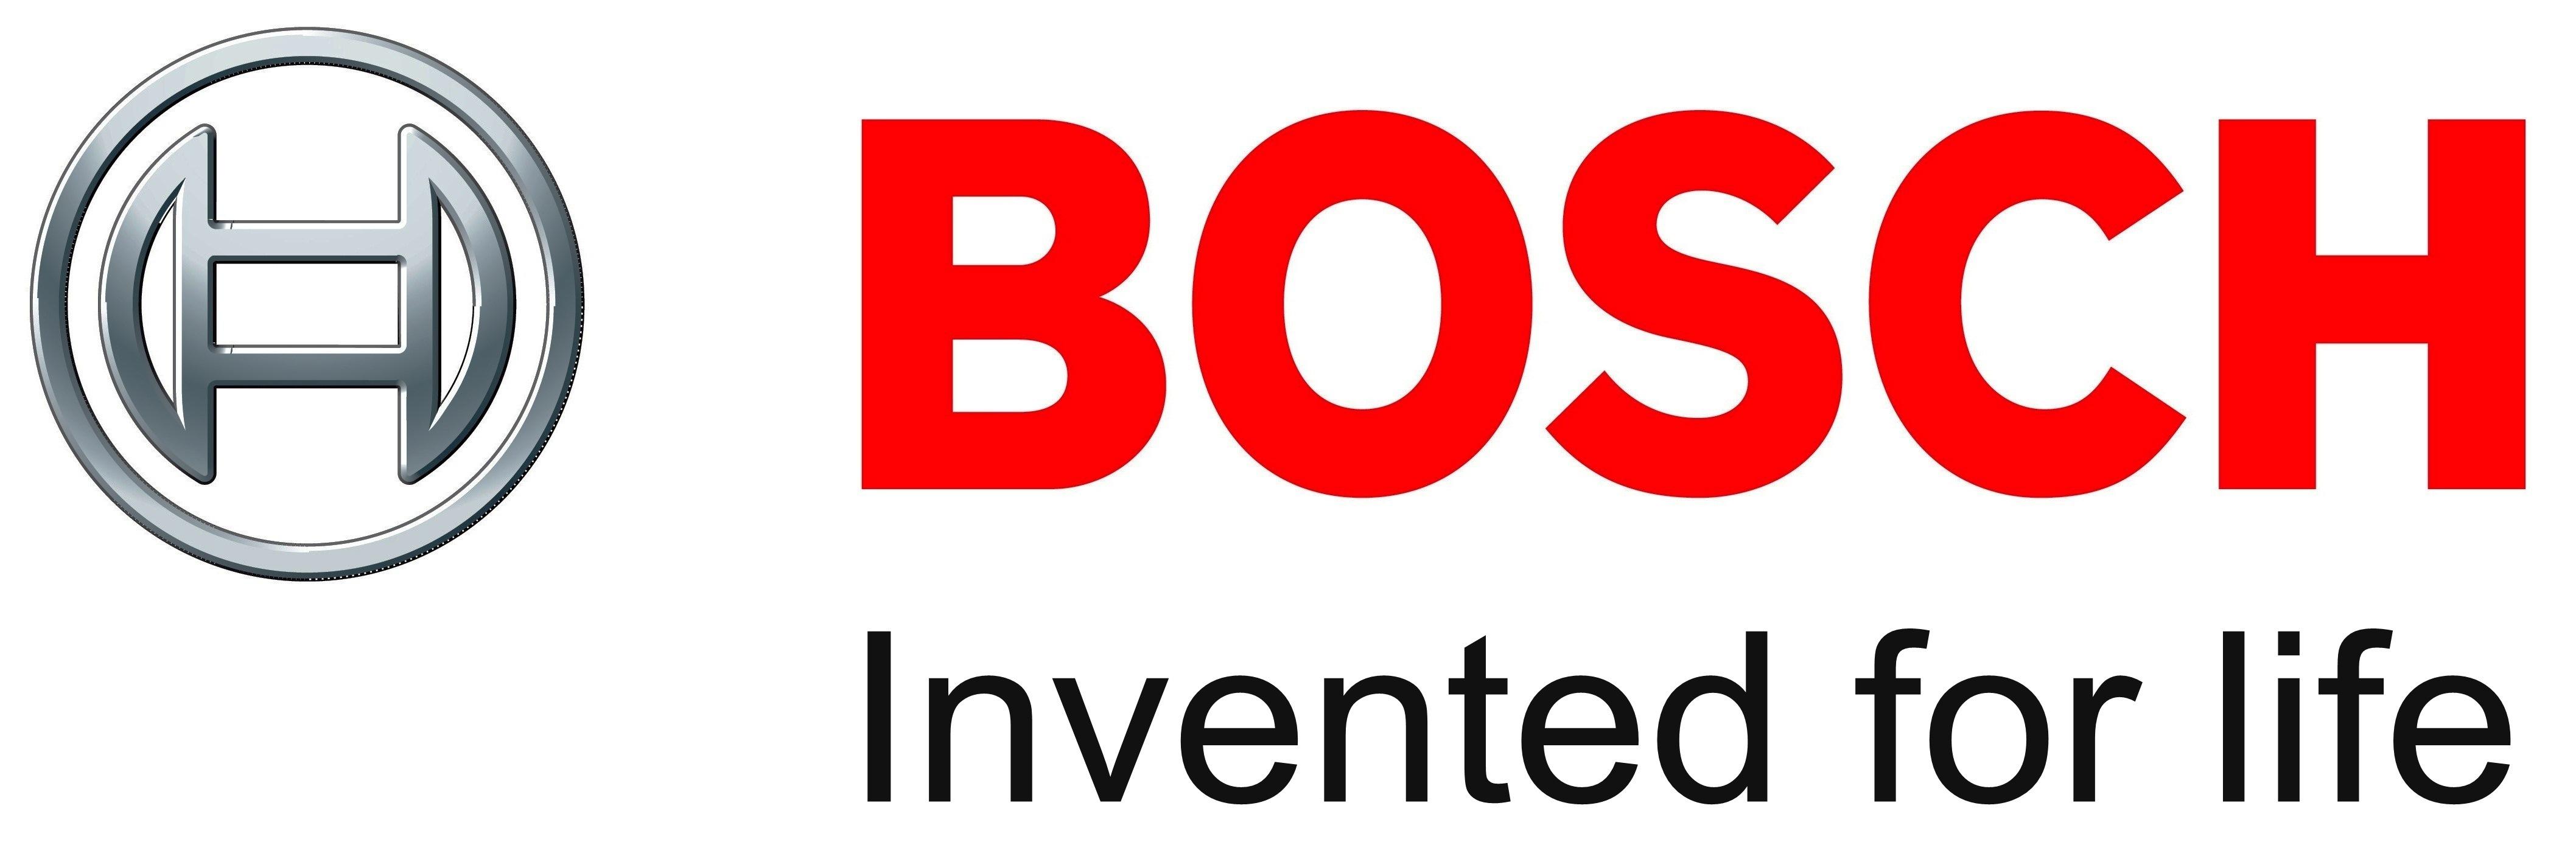 bosch-tools-logo | Future Trucking & Logistics